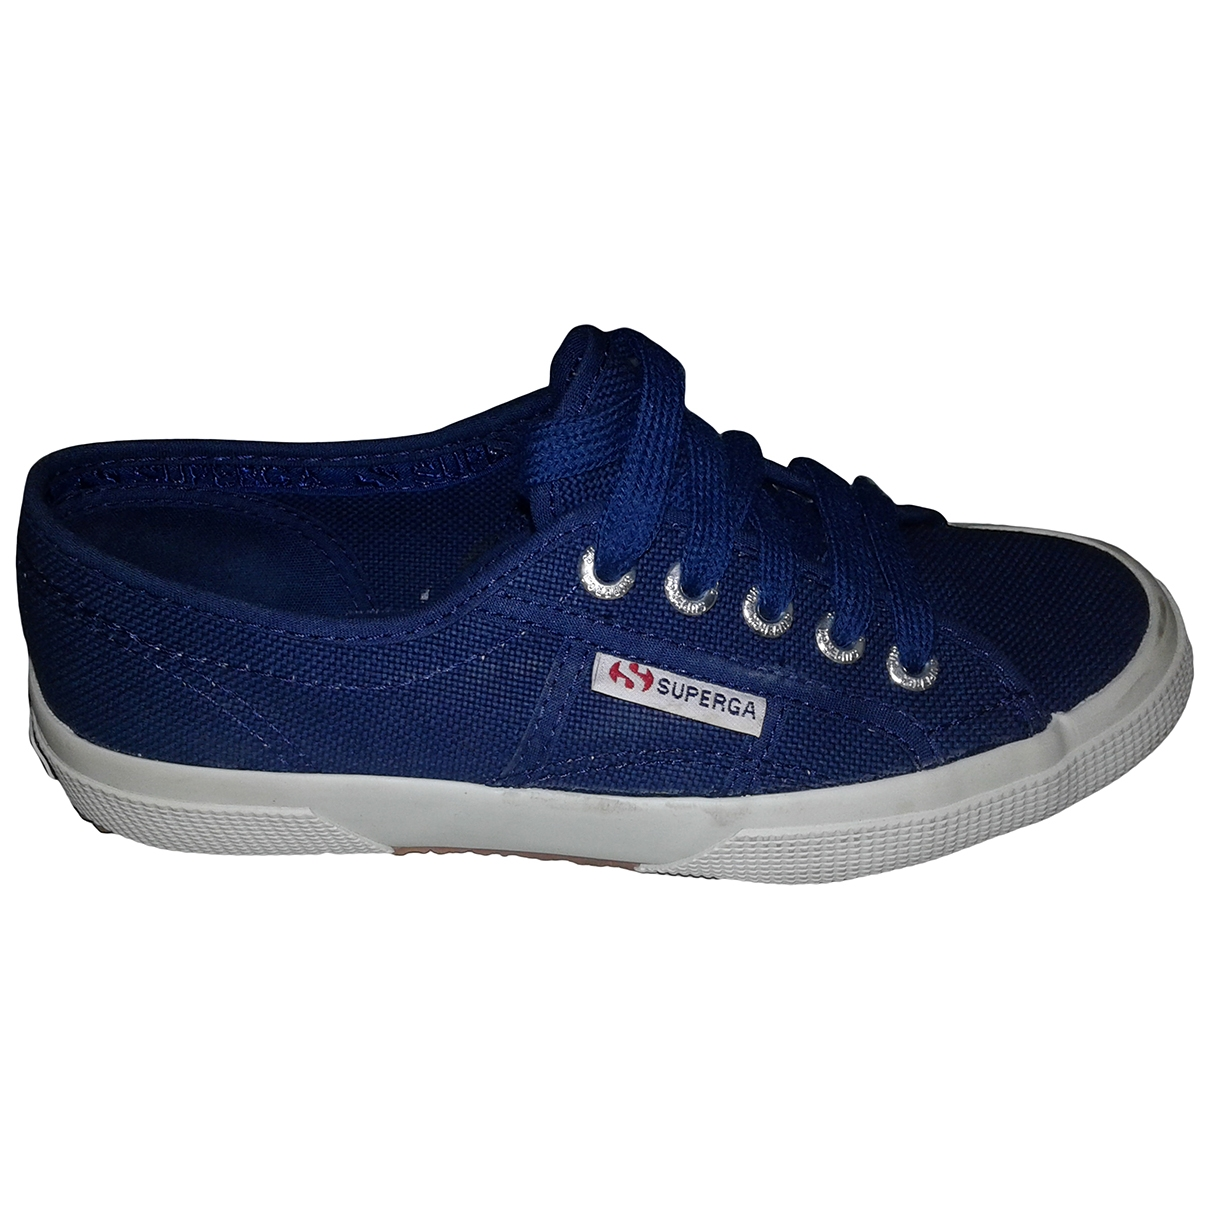 Superga \N Sneakers in  Blau Kautschuk